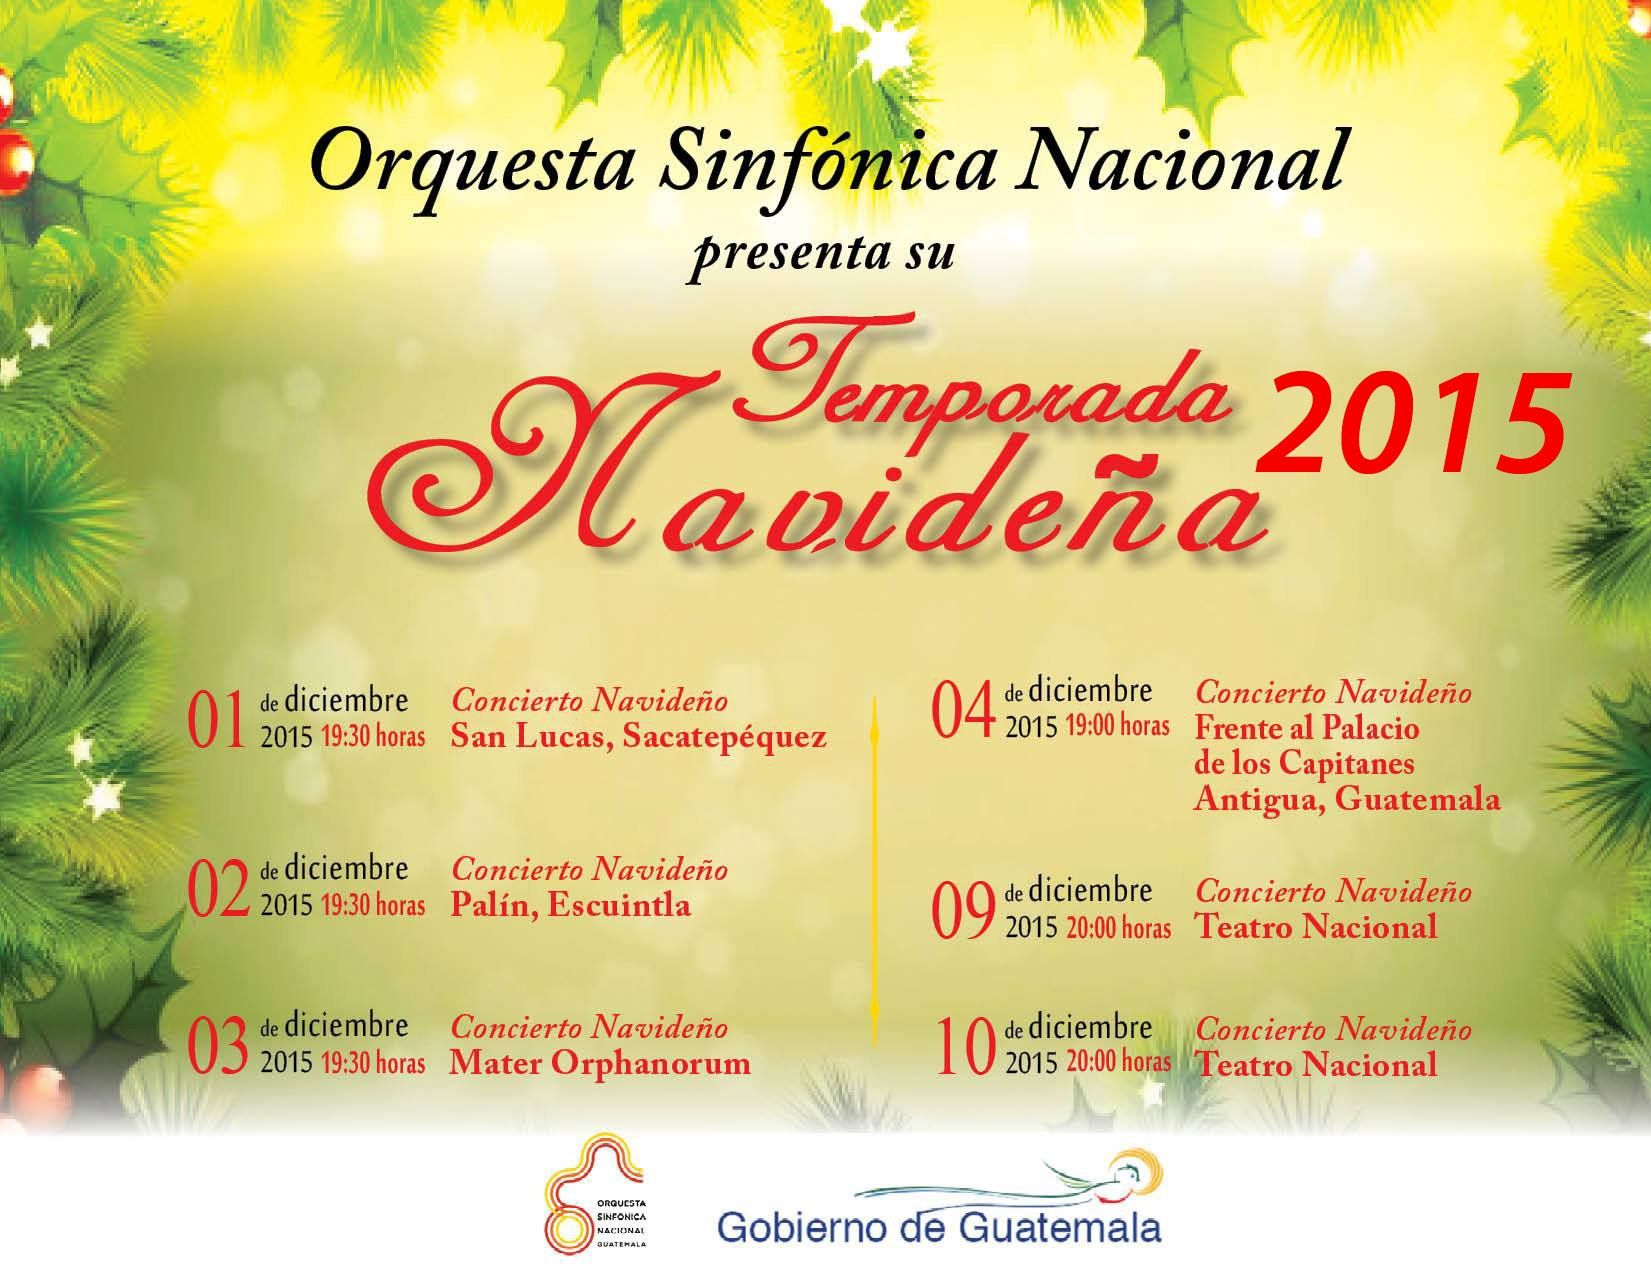 agenda osn 2015